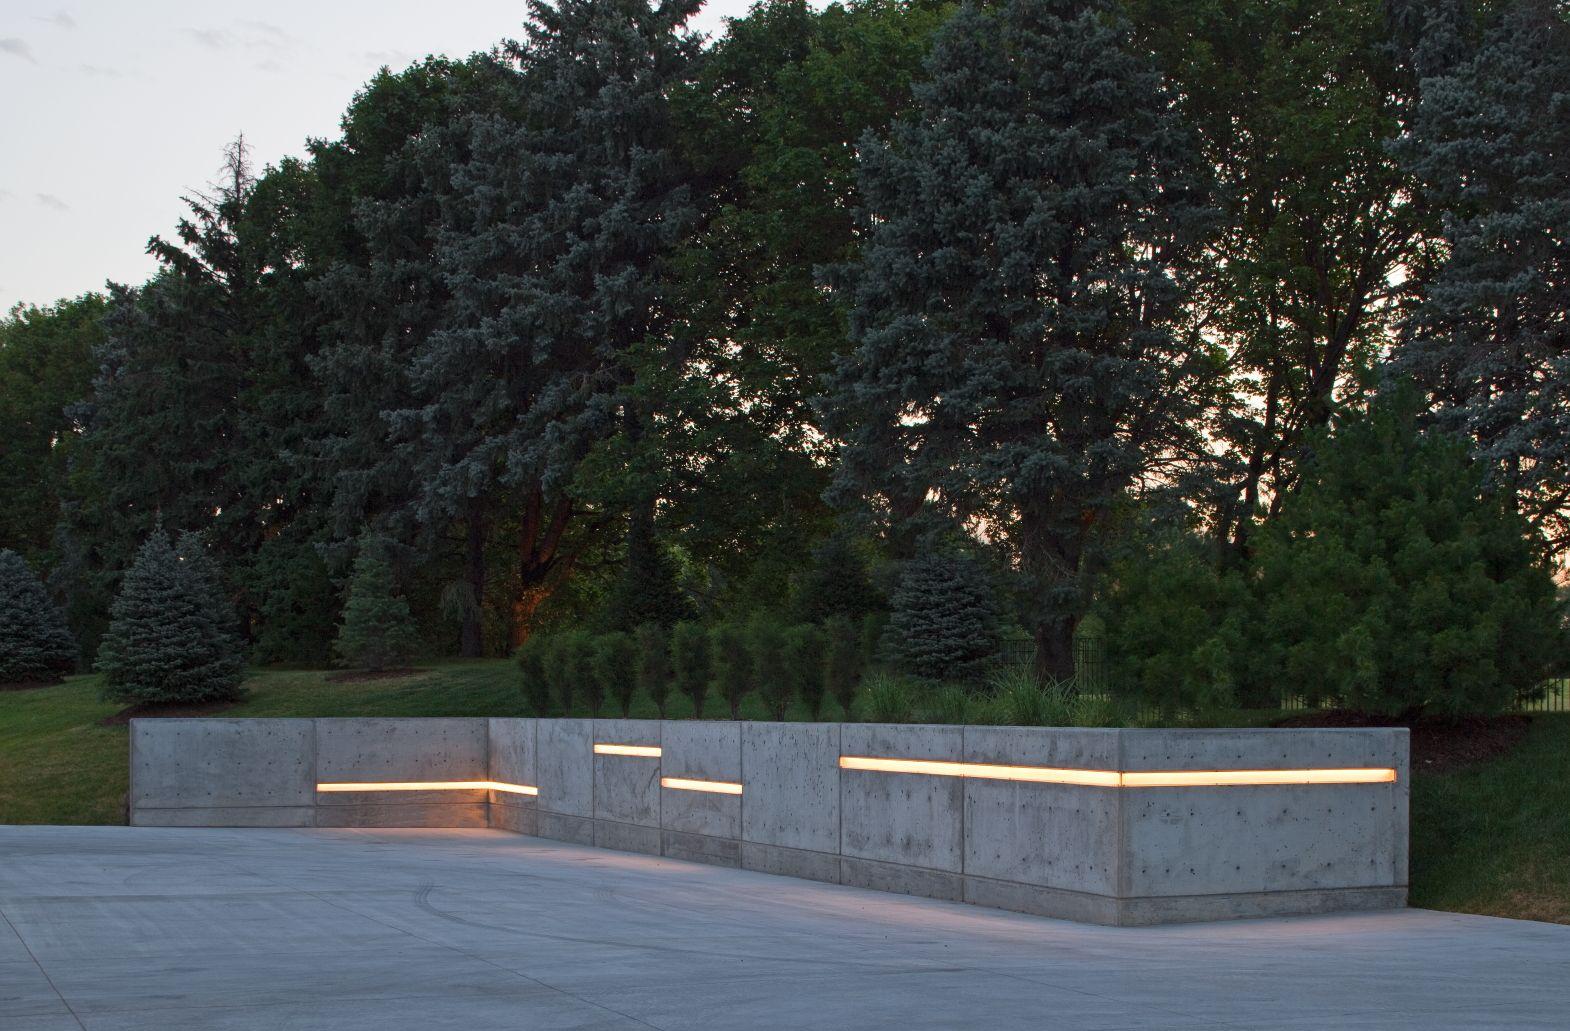 Massivt Spring 2012 Landscape Lighting with LED strip lighting in long OB94